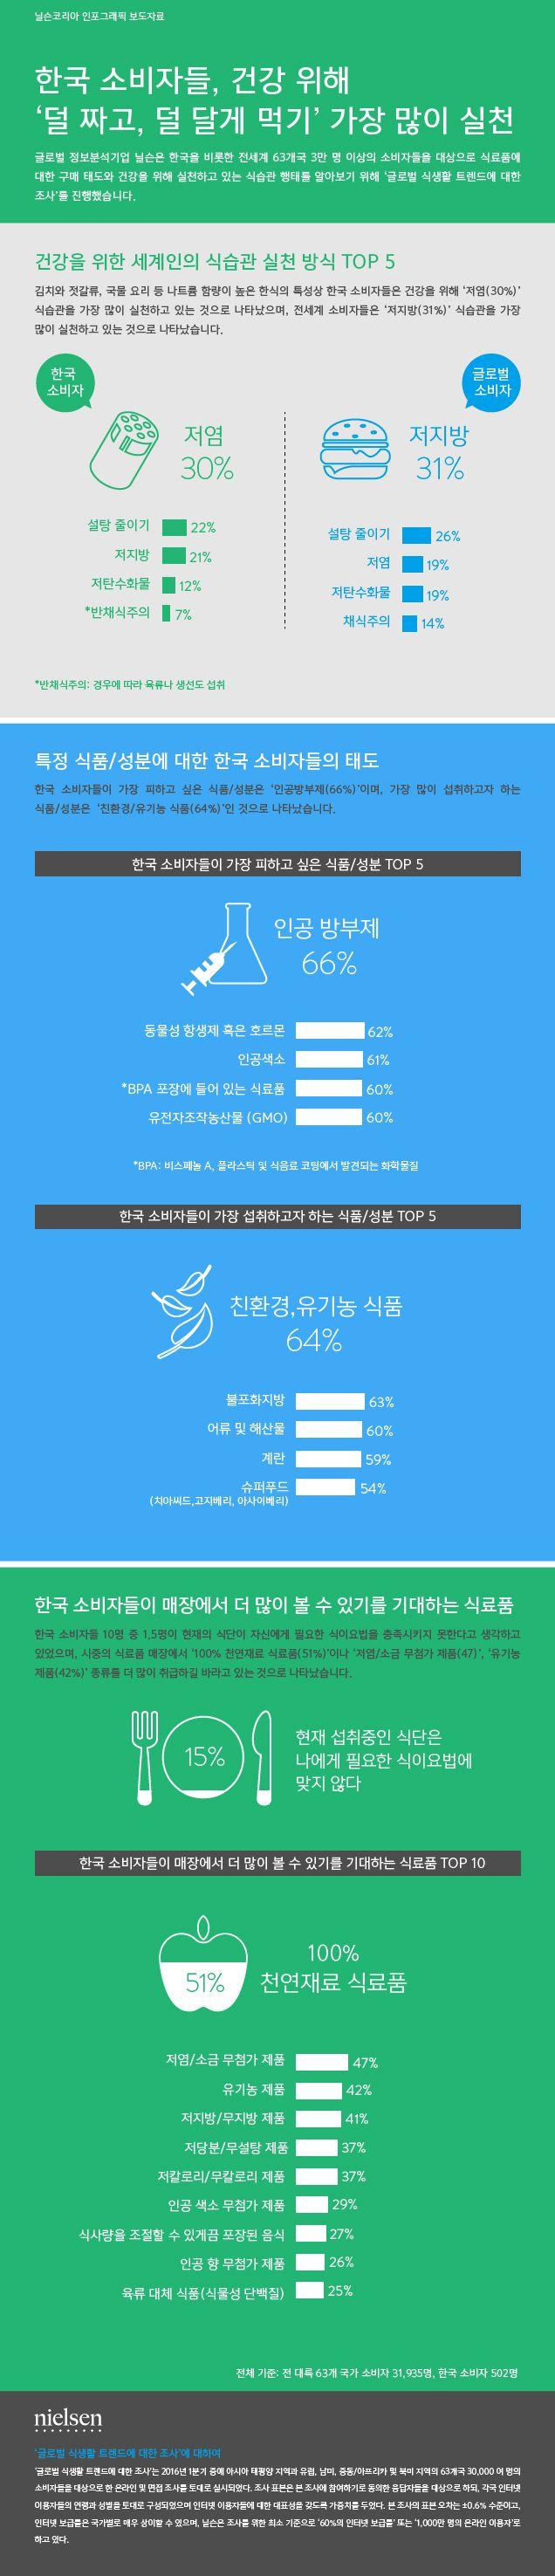 [Nielsen Korea Infographic] 닐슨 전세계 소비자의 식료품에 대한 구매 태도와 건강을 위해 실천하고 있는 식습관 행태를 알아볼 수 있는 '글로벌 식생활 트렌드 리포트' 발간(Ingredient and Dining Out Trend Report) #nielsenkorea #infographic #닐슨코리아 #인포그래픽 #식생활 #건강